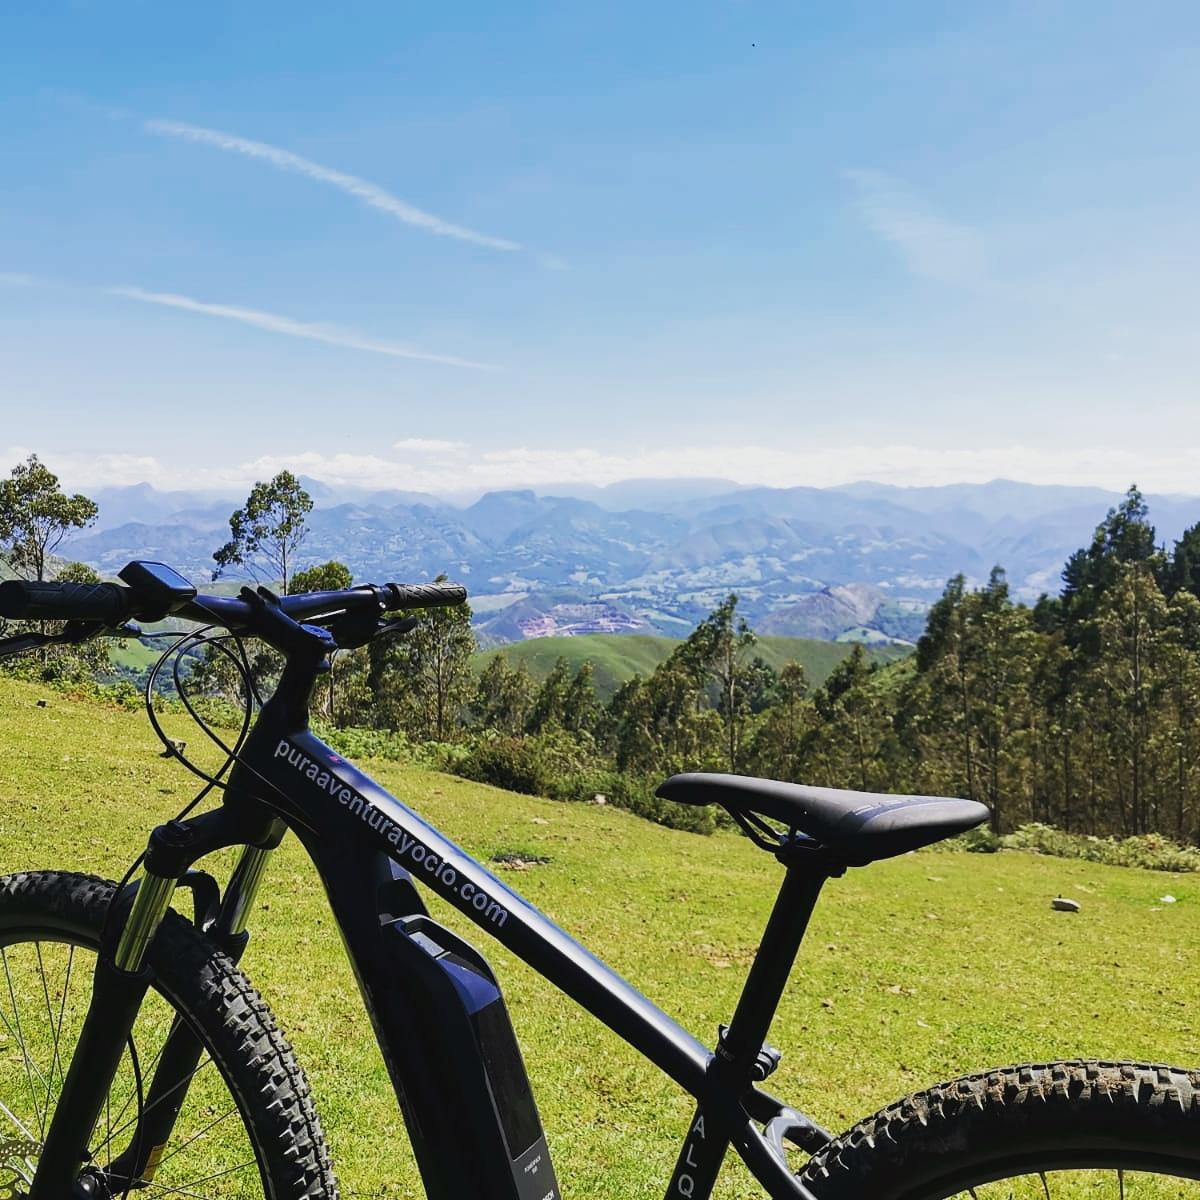 Días de verano, días de bicicleta. Descubre la btt eléctrica con nosotros. Consultanos sin compromiso o accede a https://t.co/Sw2n0mnyEV #puraaventurayocio #bike #bikeinstagram #piloña #btt #turismoasturias #turismonacional  #ebike #bicielectrica #alquilerdebicicletaselectricas https://t.co/LT1UEwV7Fr